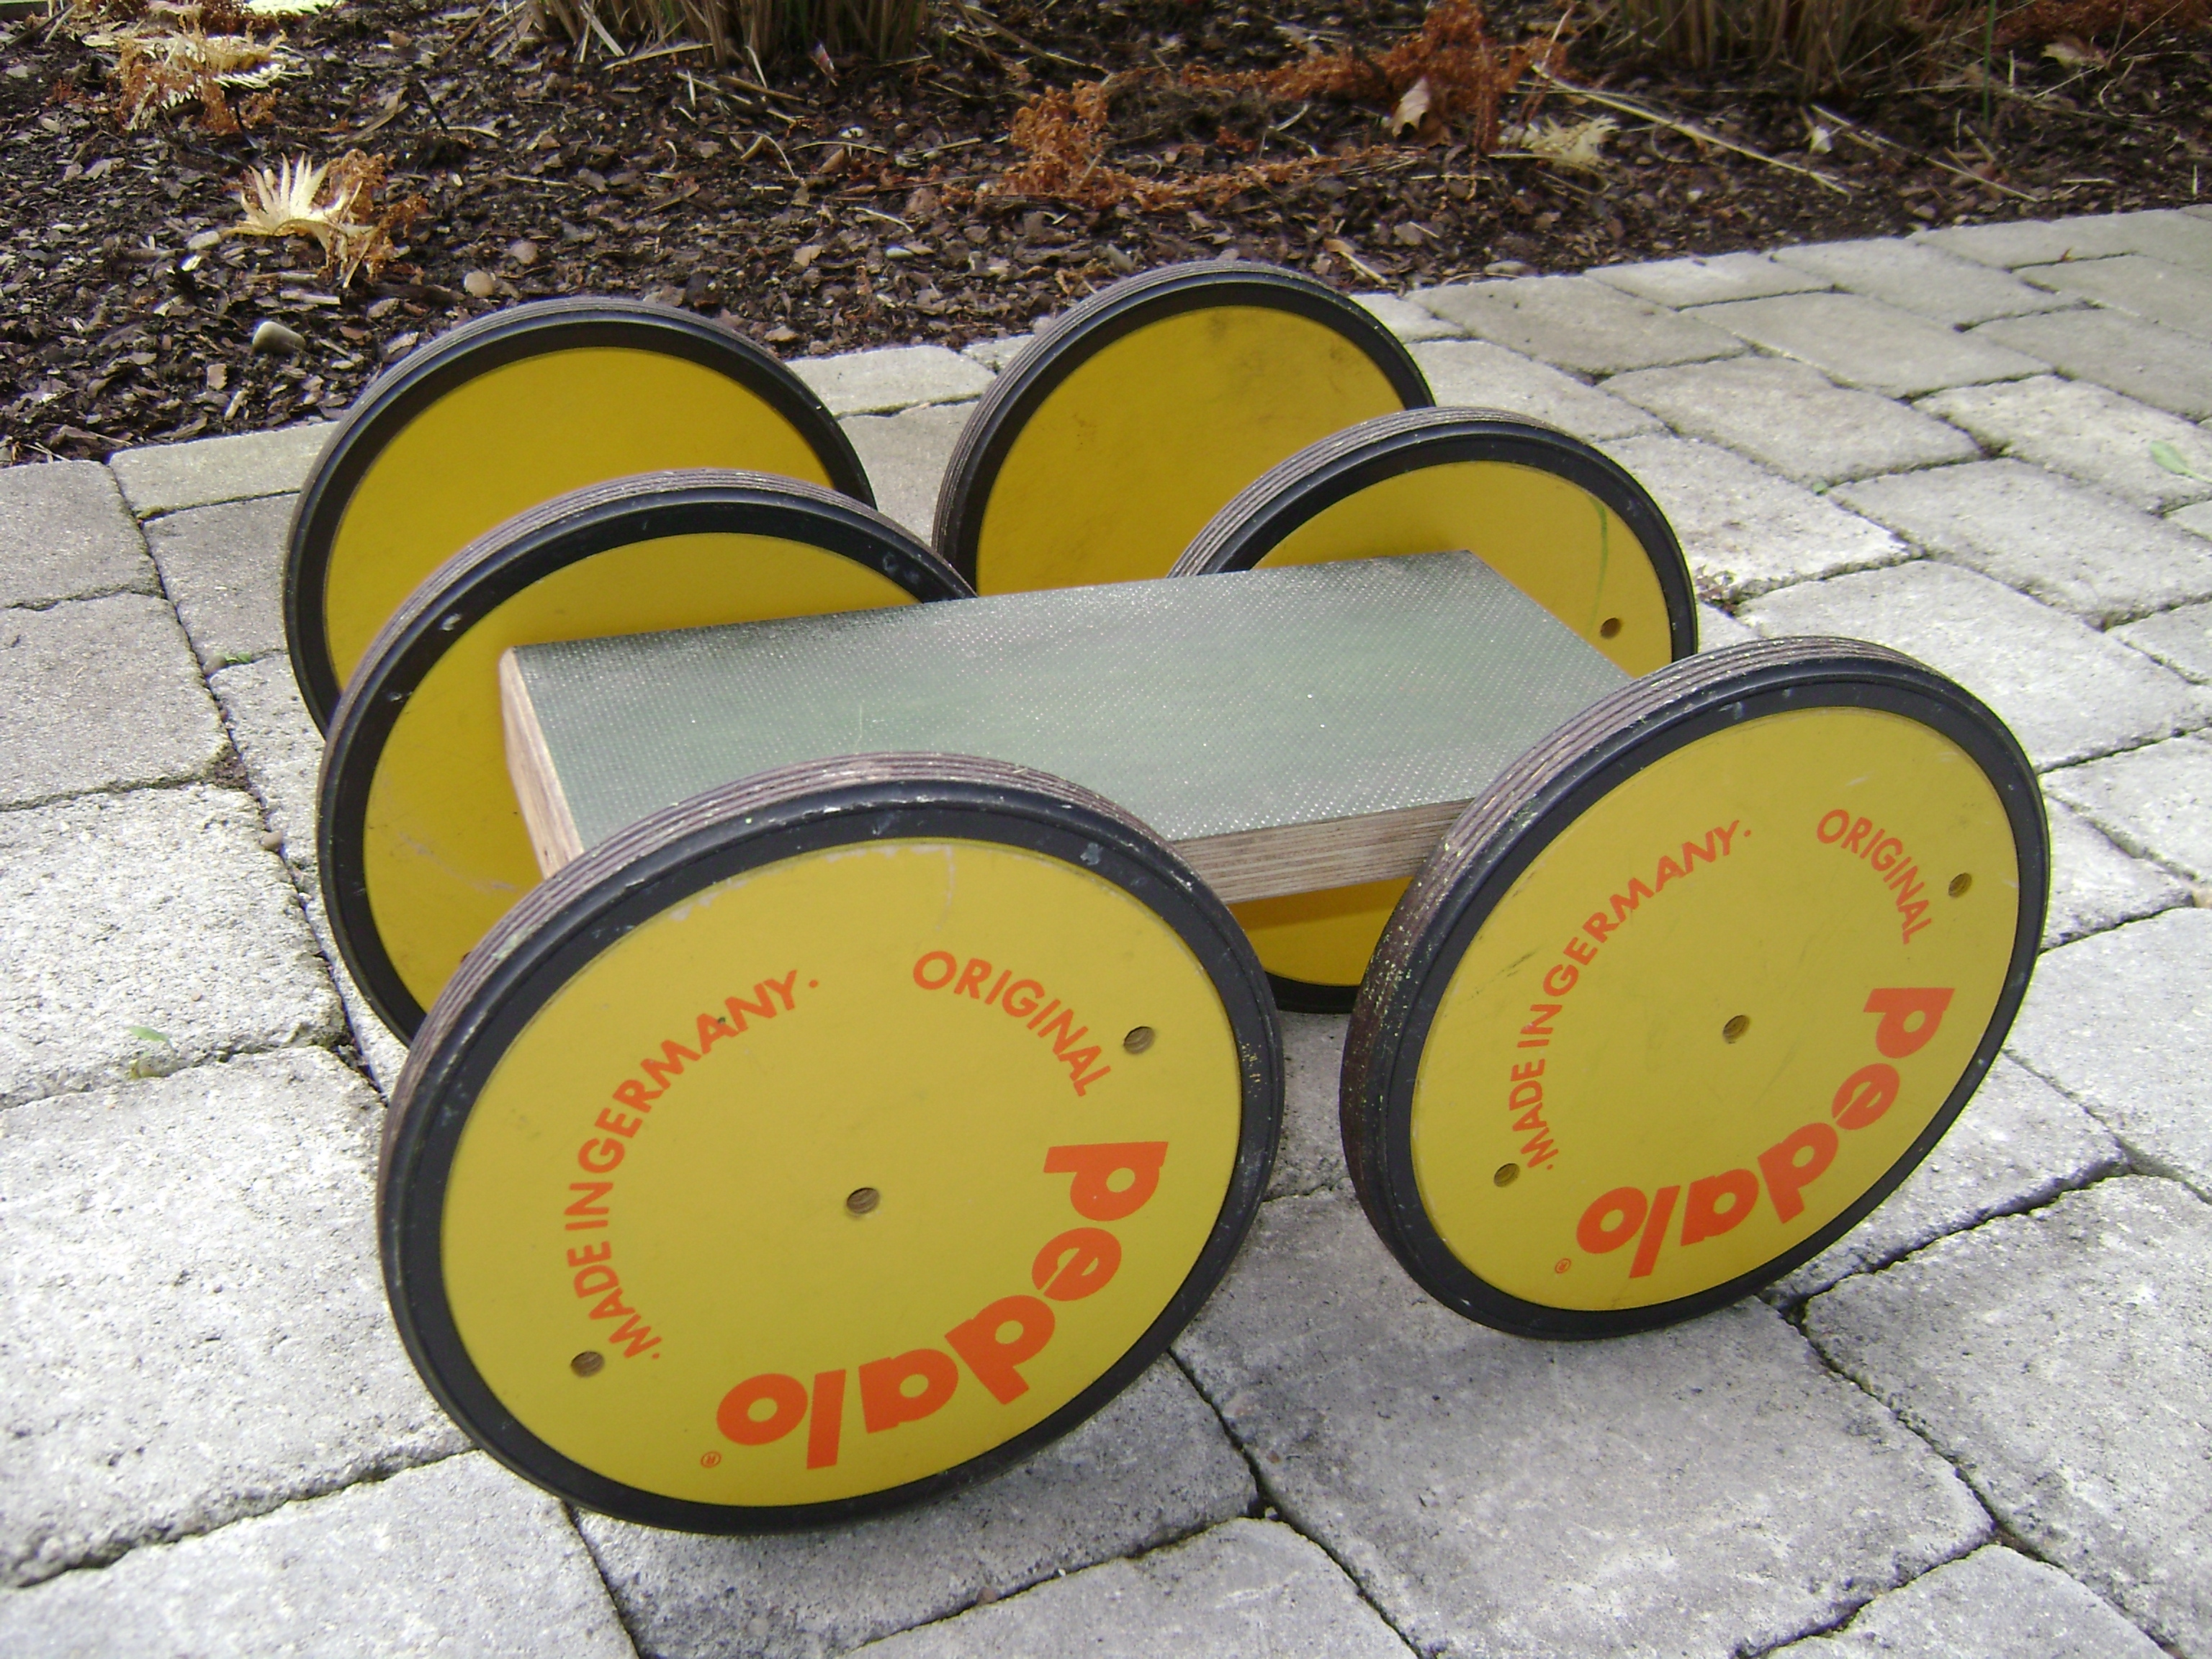 pedalos